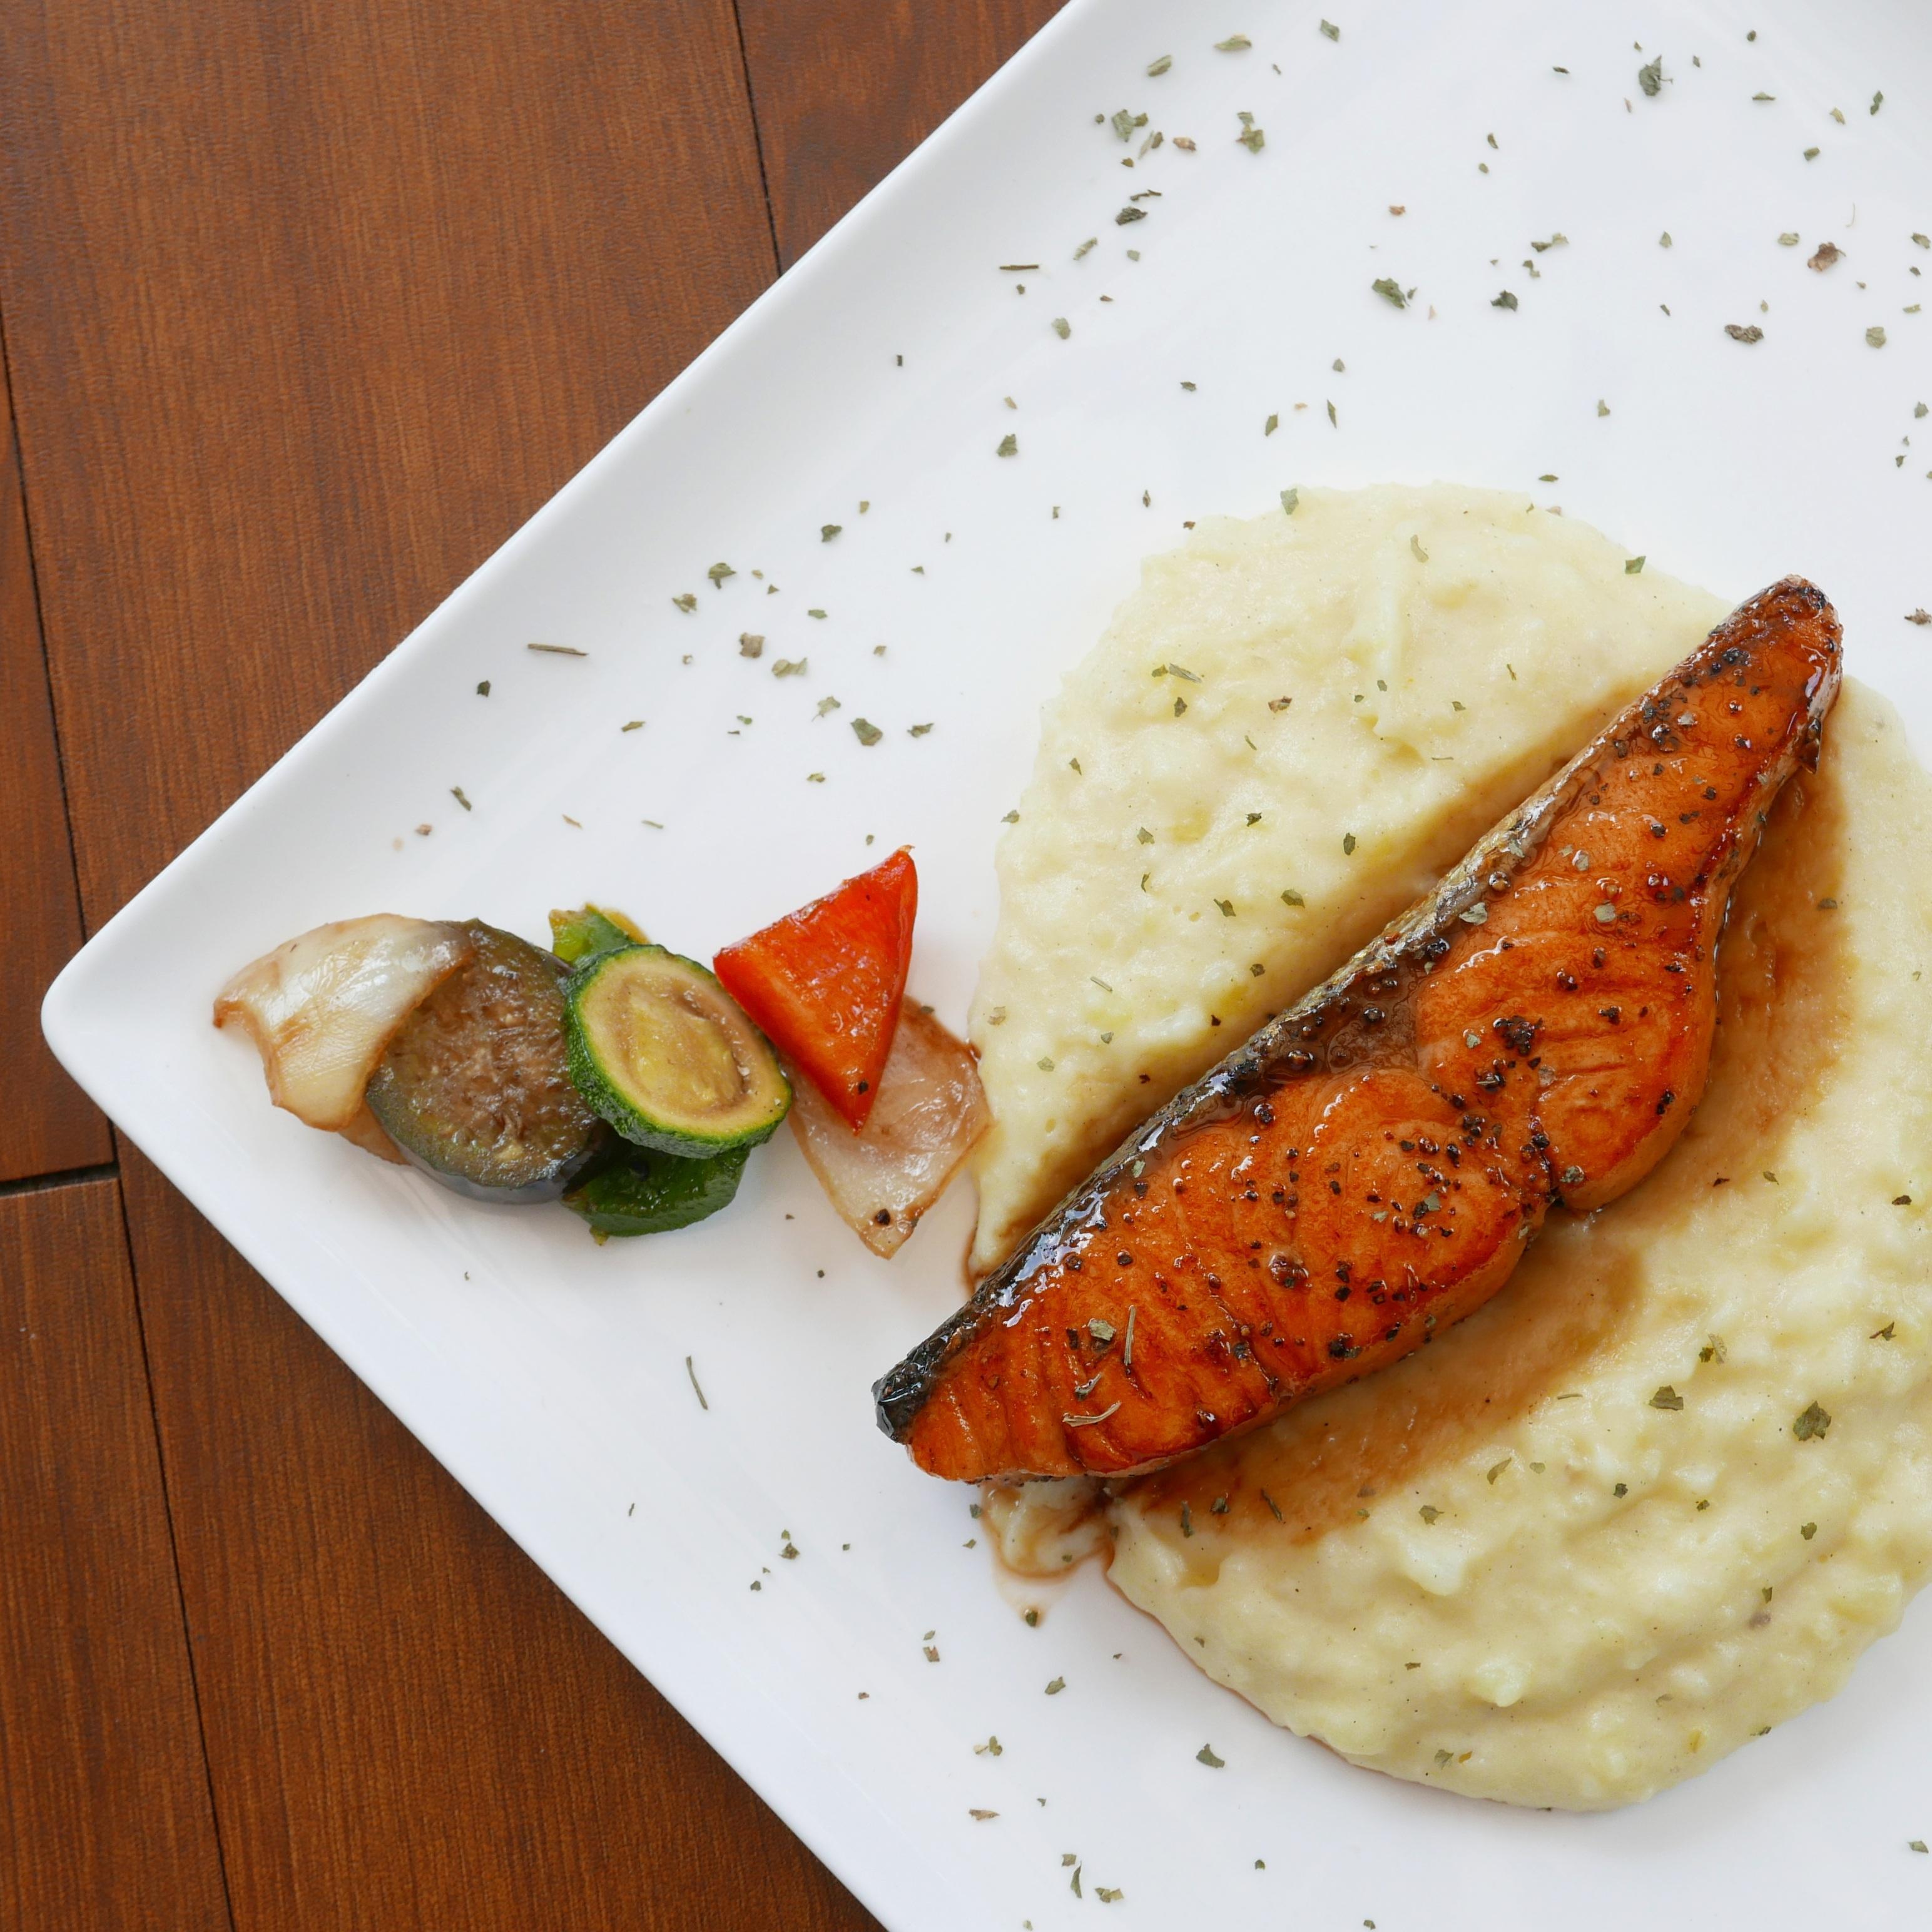 Grilled Soy Salmon Fillet